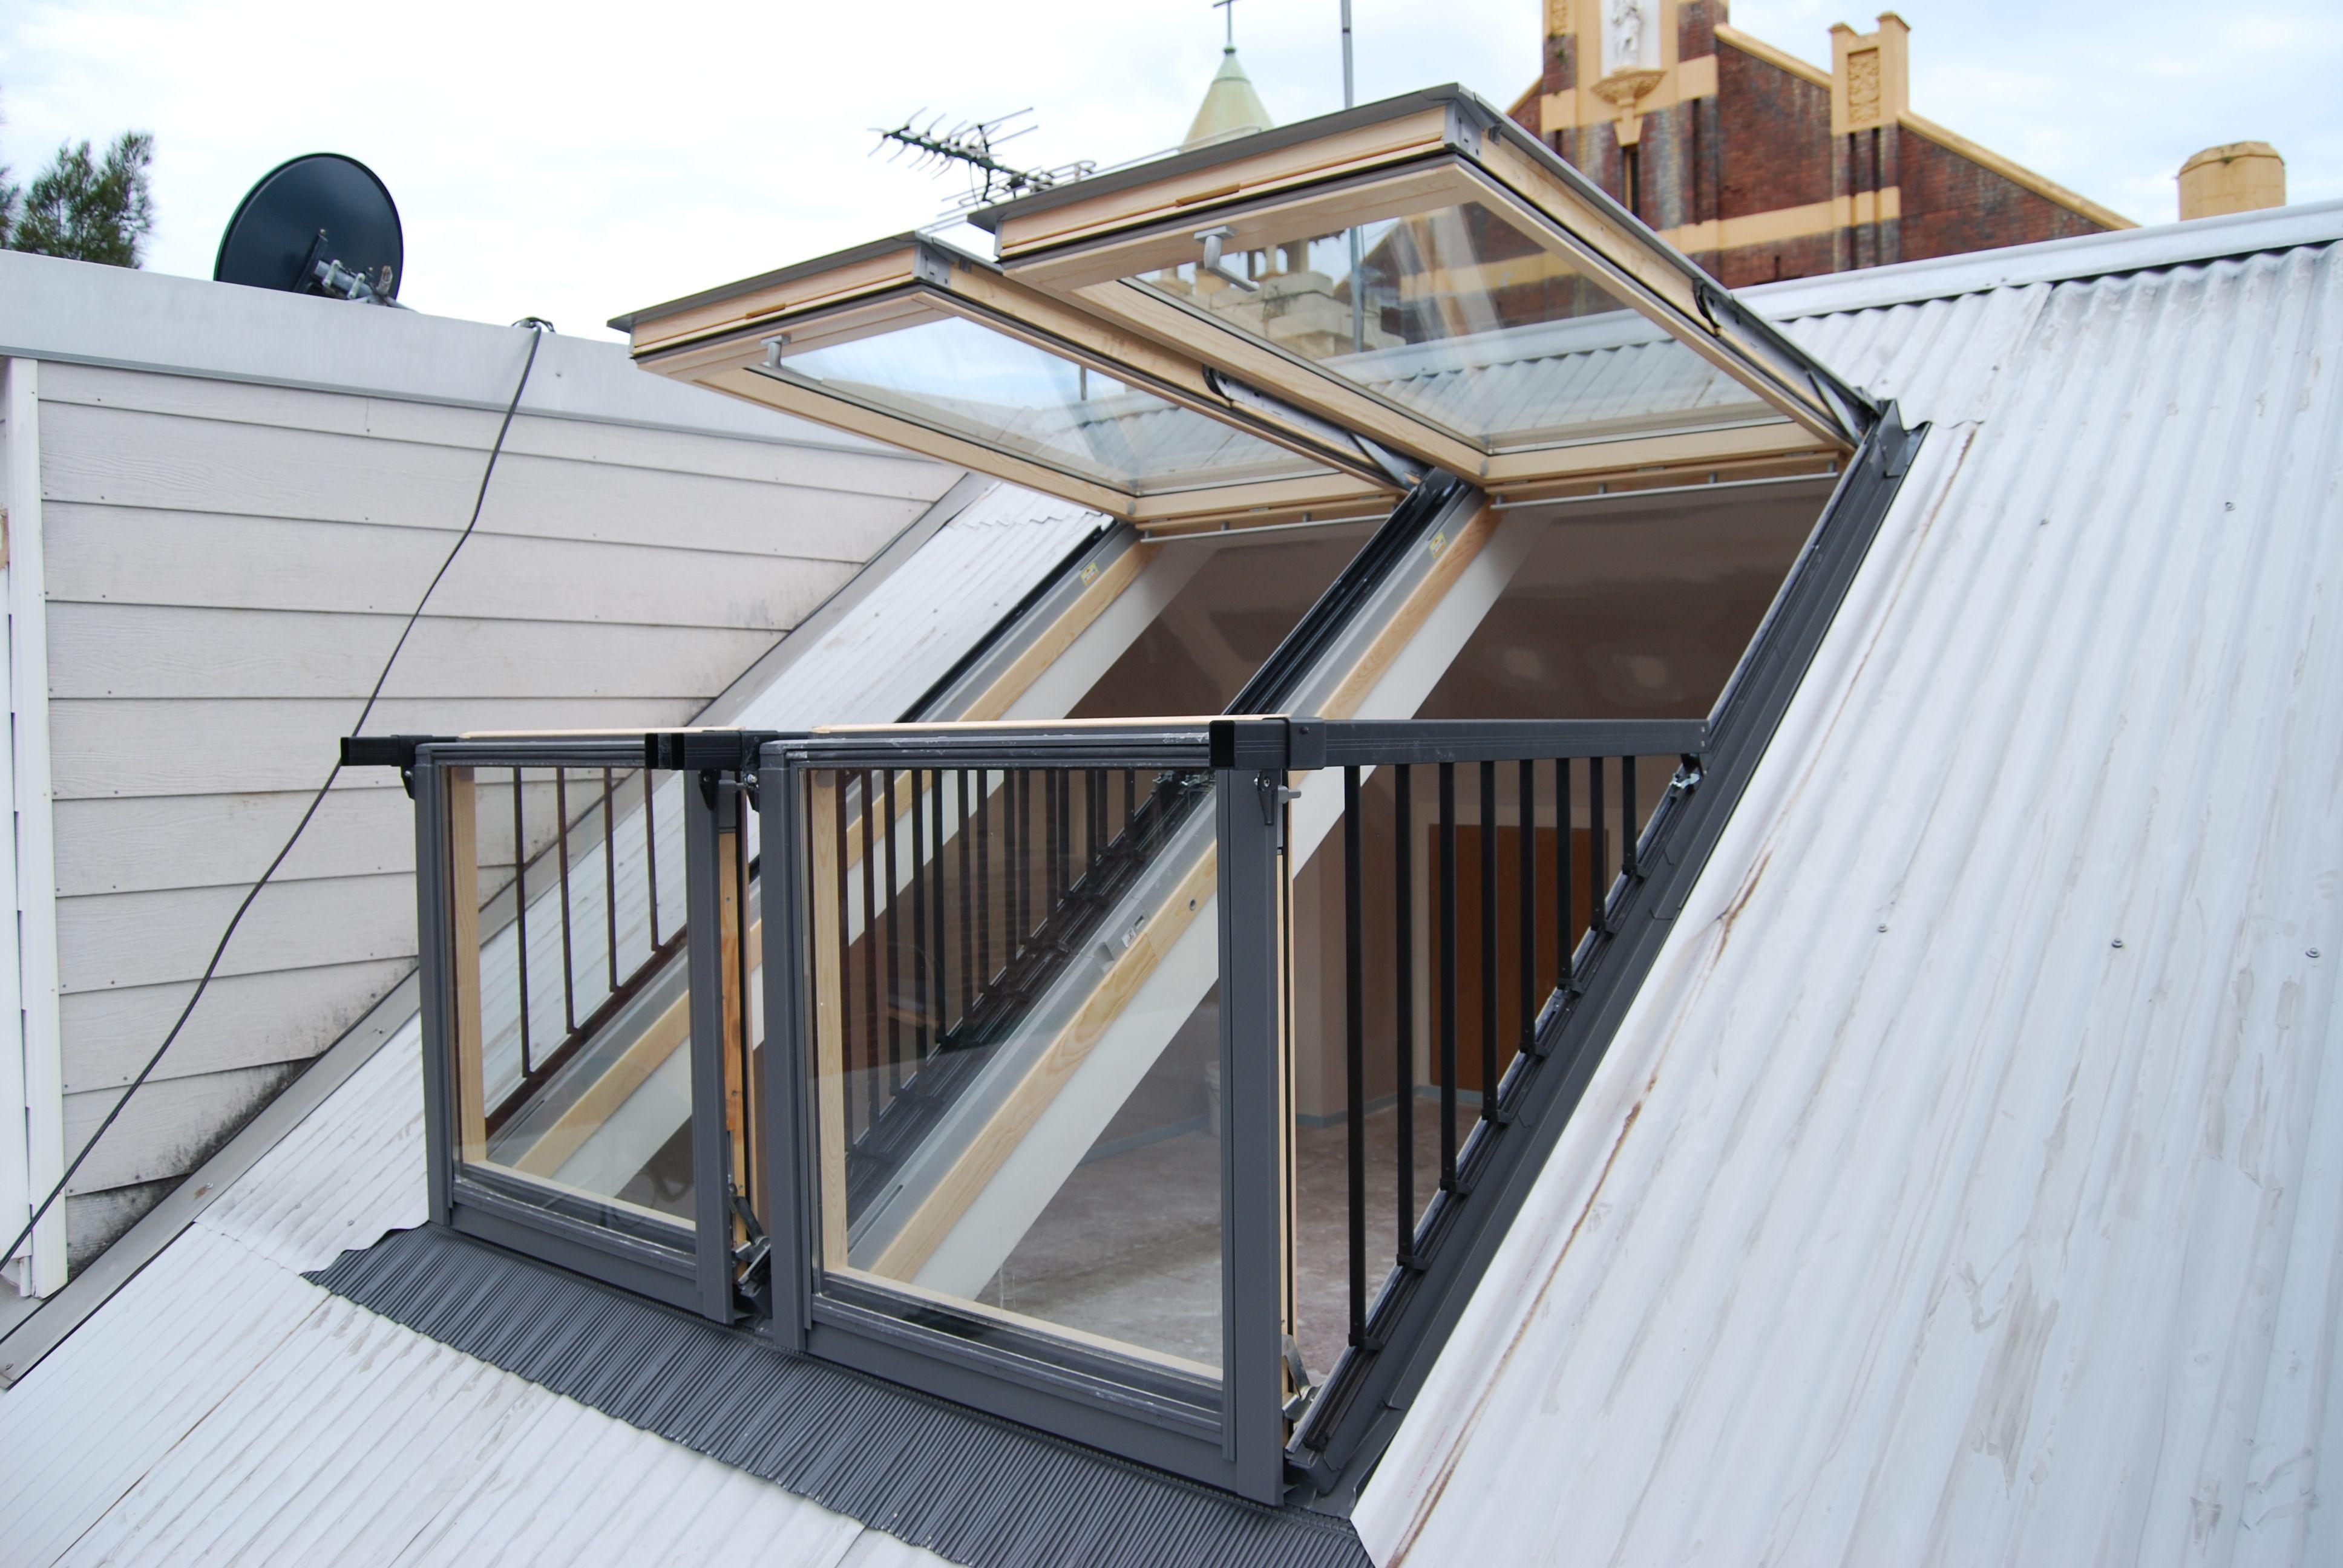 Velux window ideas  fenetres de toit balcon  grenier  pinterest  attic conversion